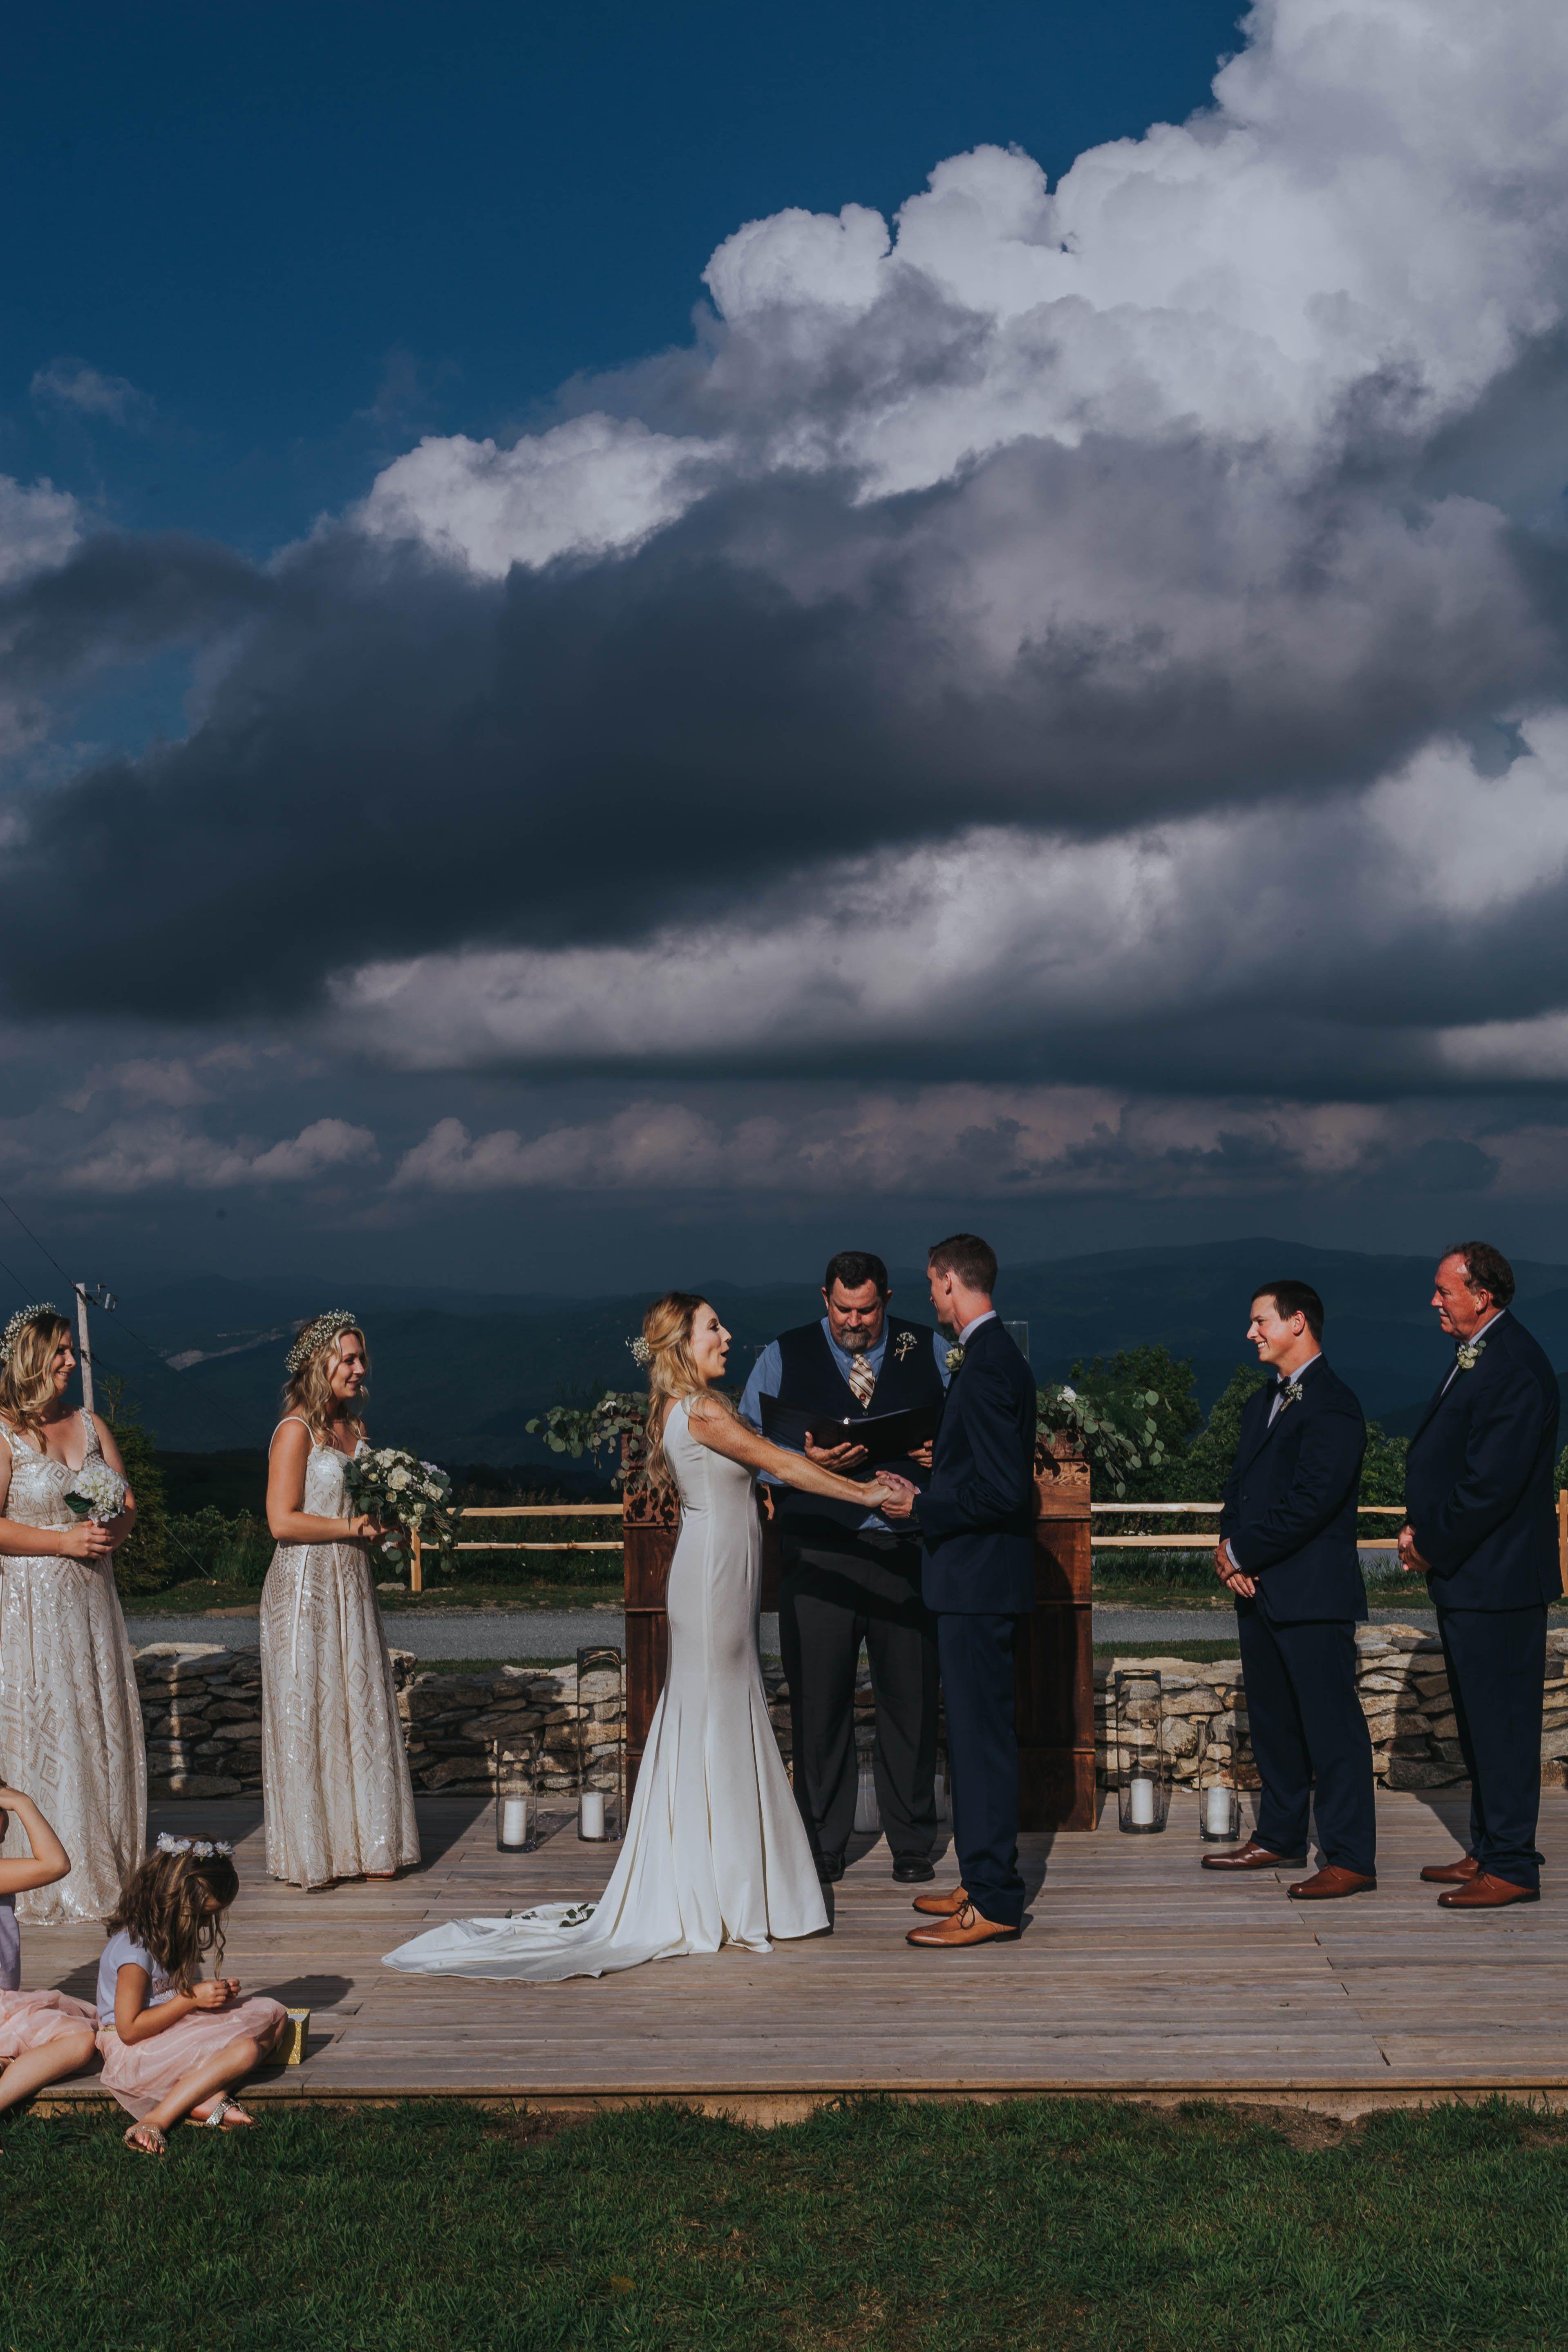 North Carolina Mountain Wedding   Rustic wedding venues ...